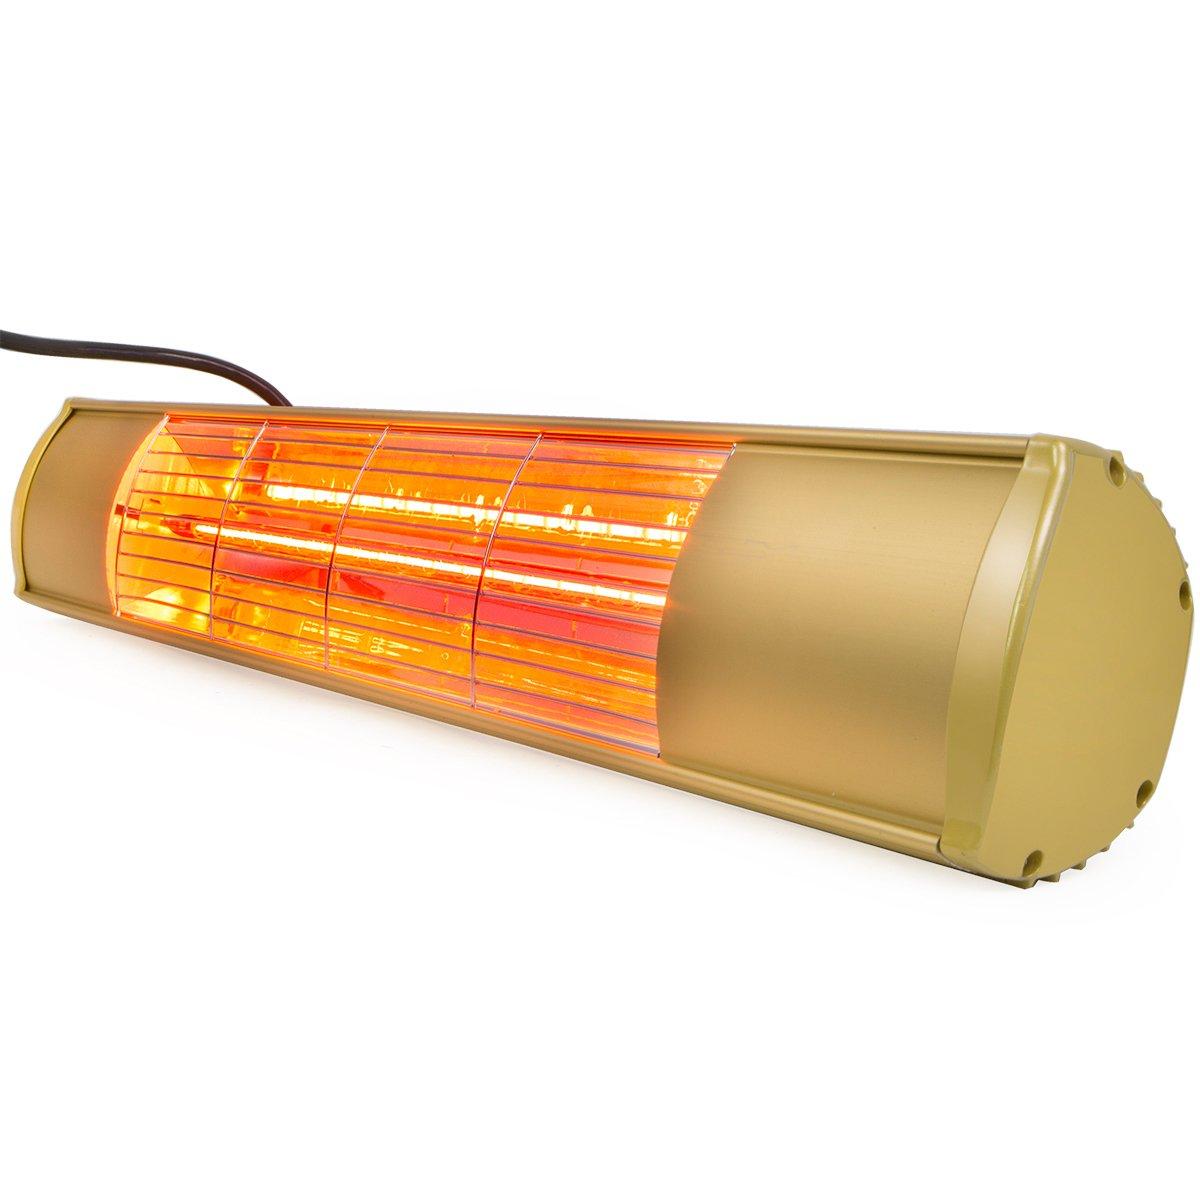 XtremepowerUS Electric Outdoor Patio Heater 1500 Watt Wall-Mounted Infrared Space Heater Gazebo Patio Environmentally Safe Balconies